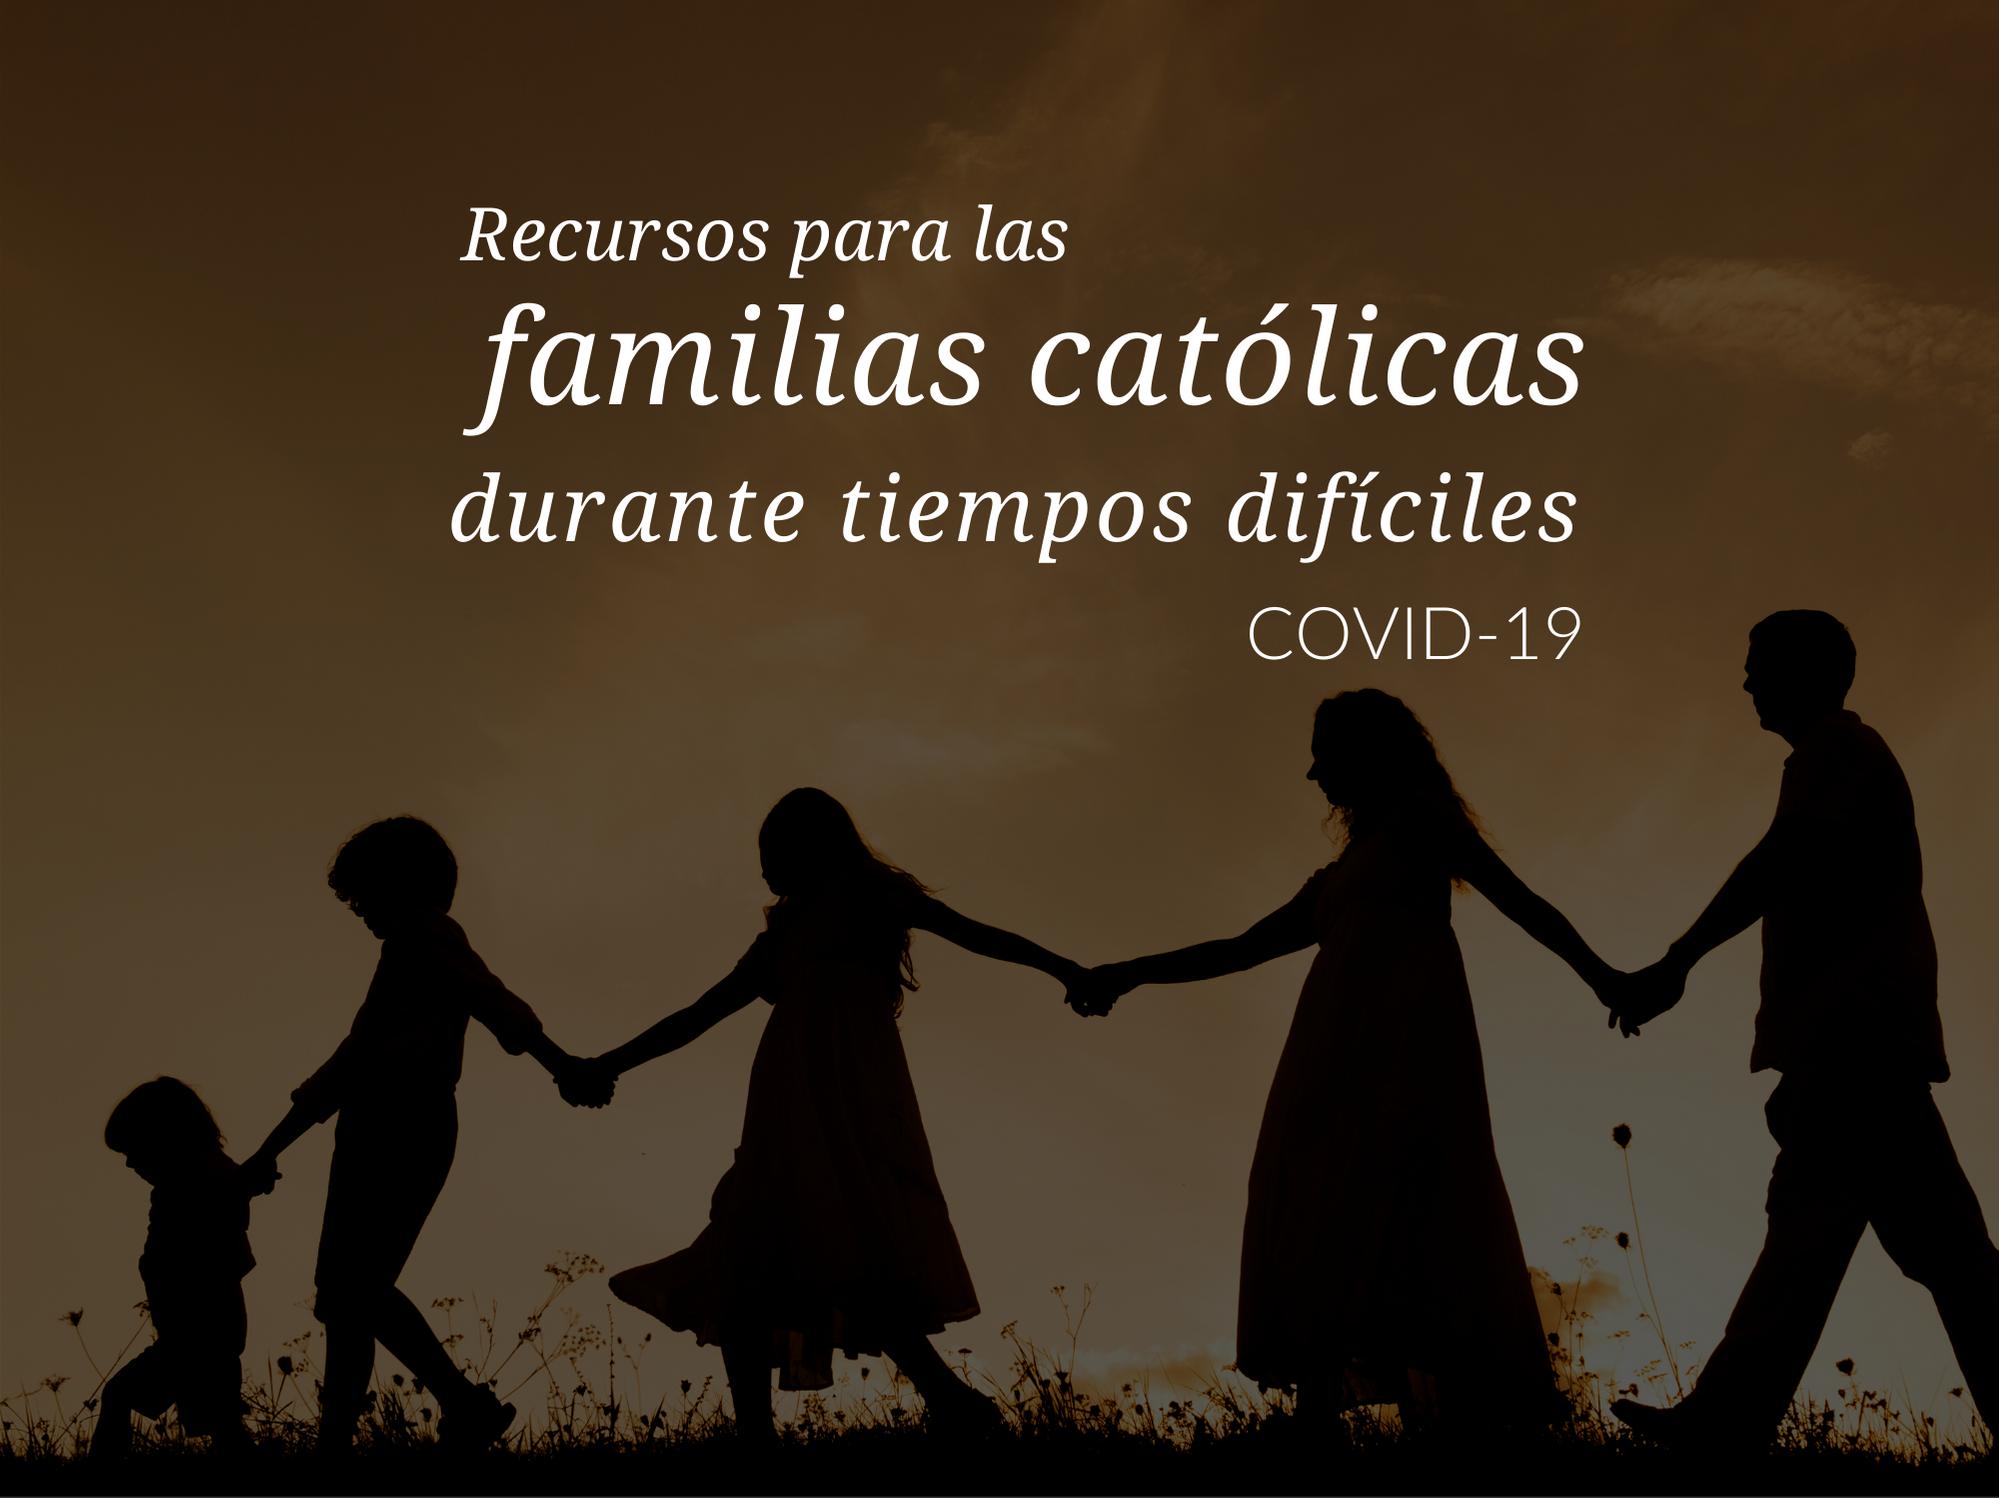 recursos-para-las-familias-catolicas-durante-covid-19